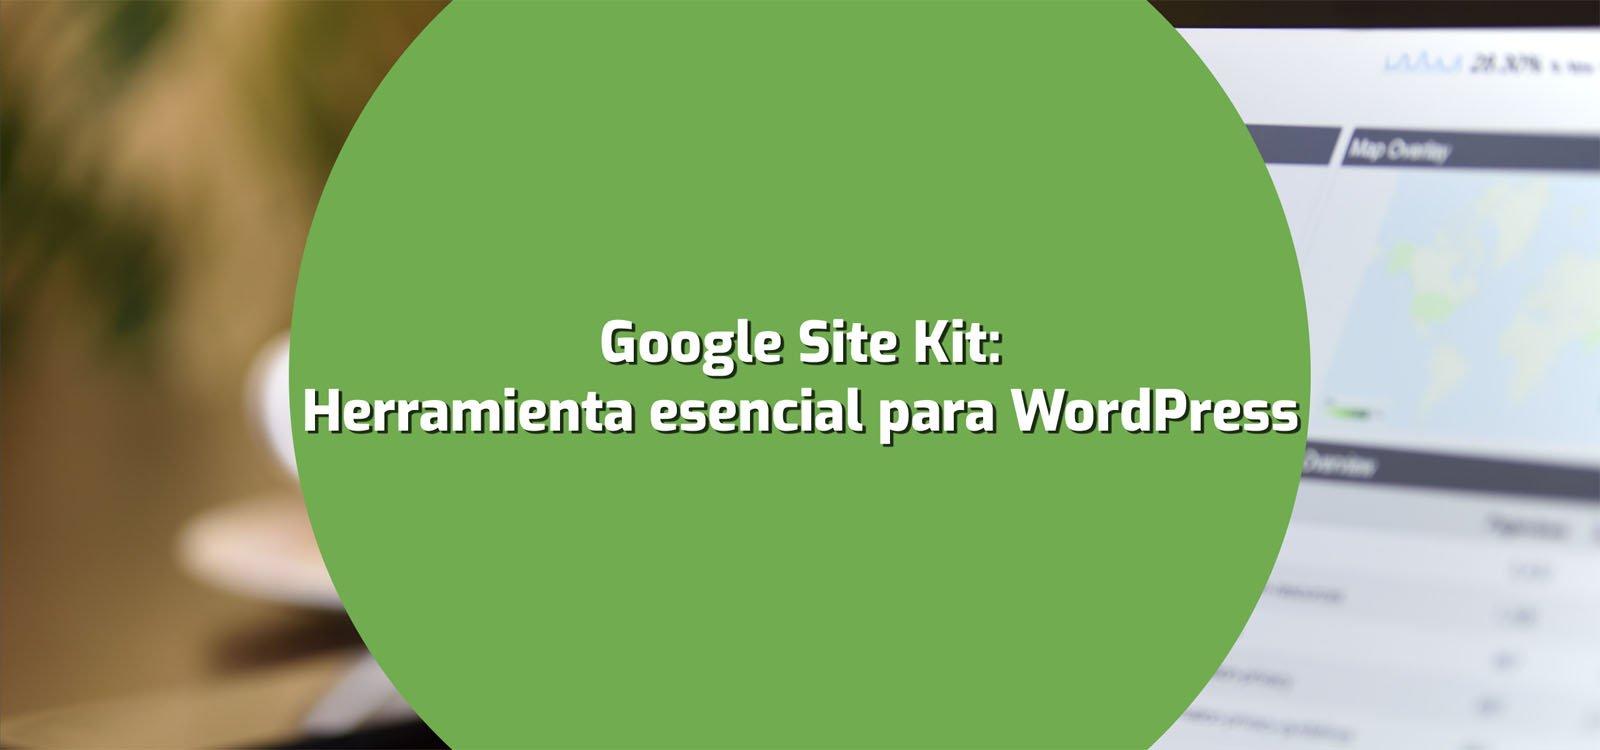 site Kit - Una herramienta esencial para WordPress